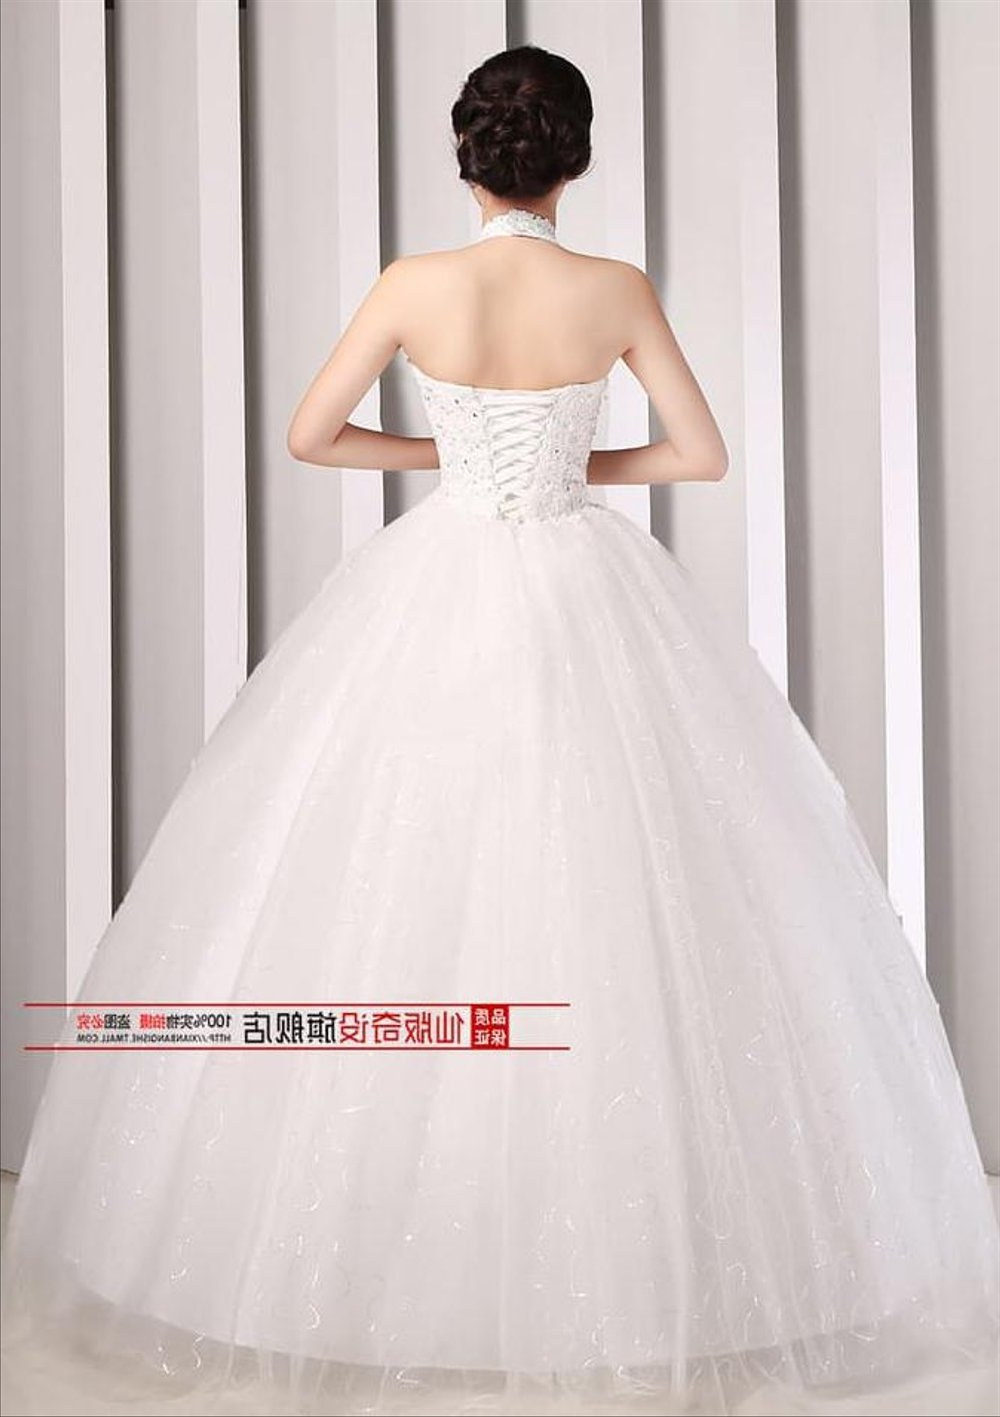 Model Gaun Pengantin Muslimah 2016 D0dg Wedding Dress Gaun Pengantin Ikat Leher Payet Bordir Korea 2016